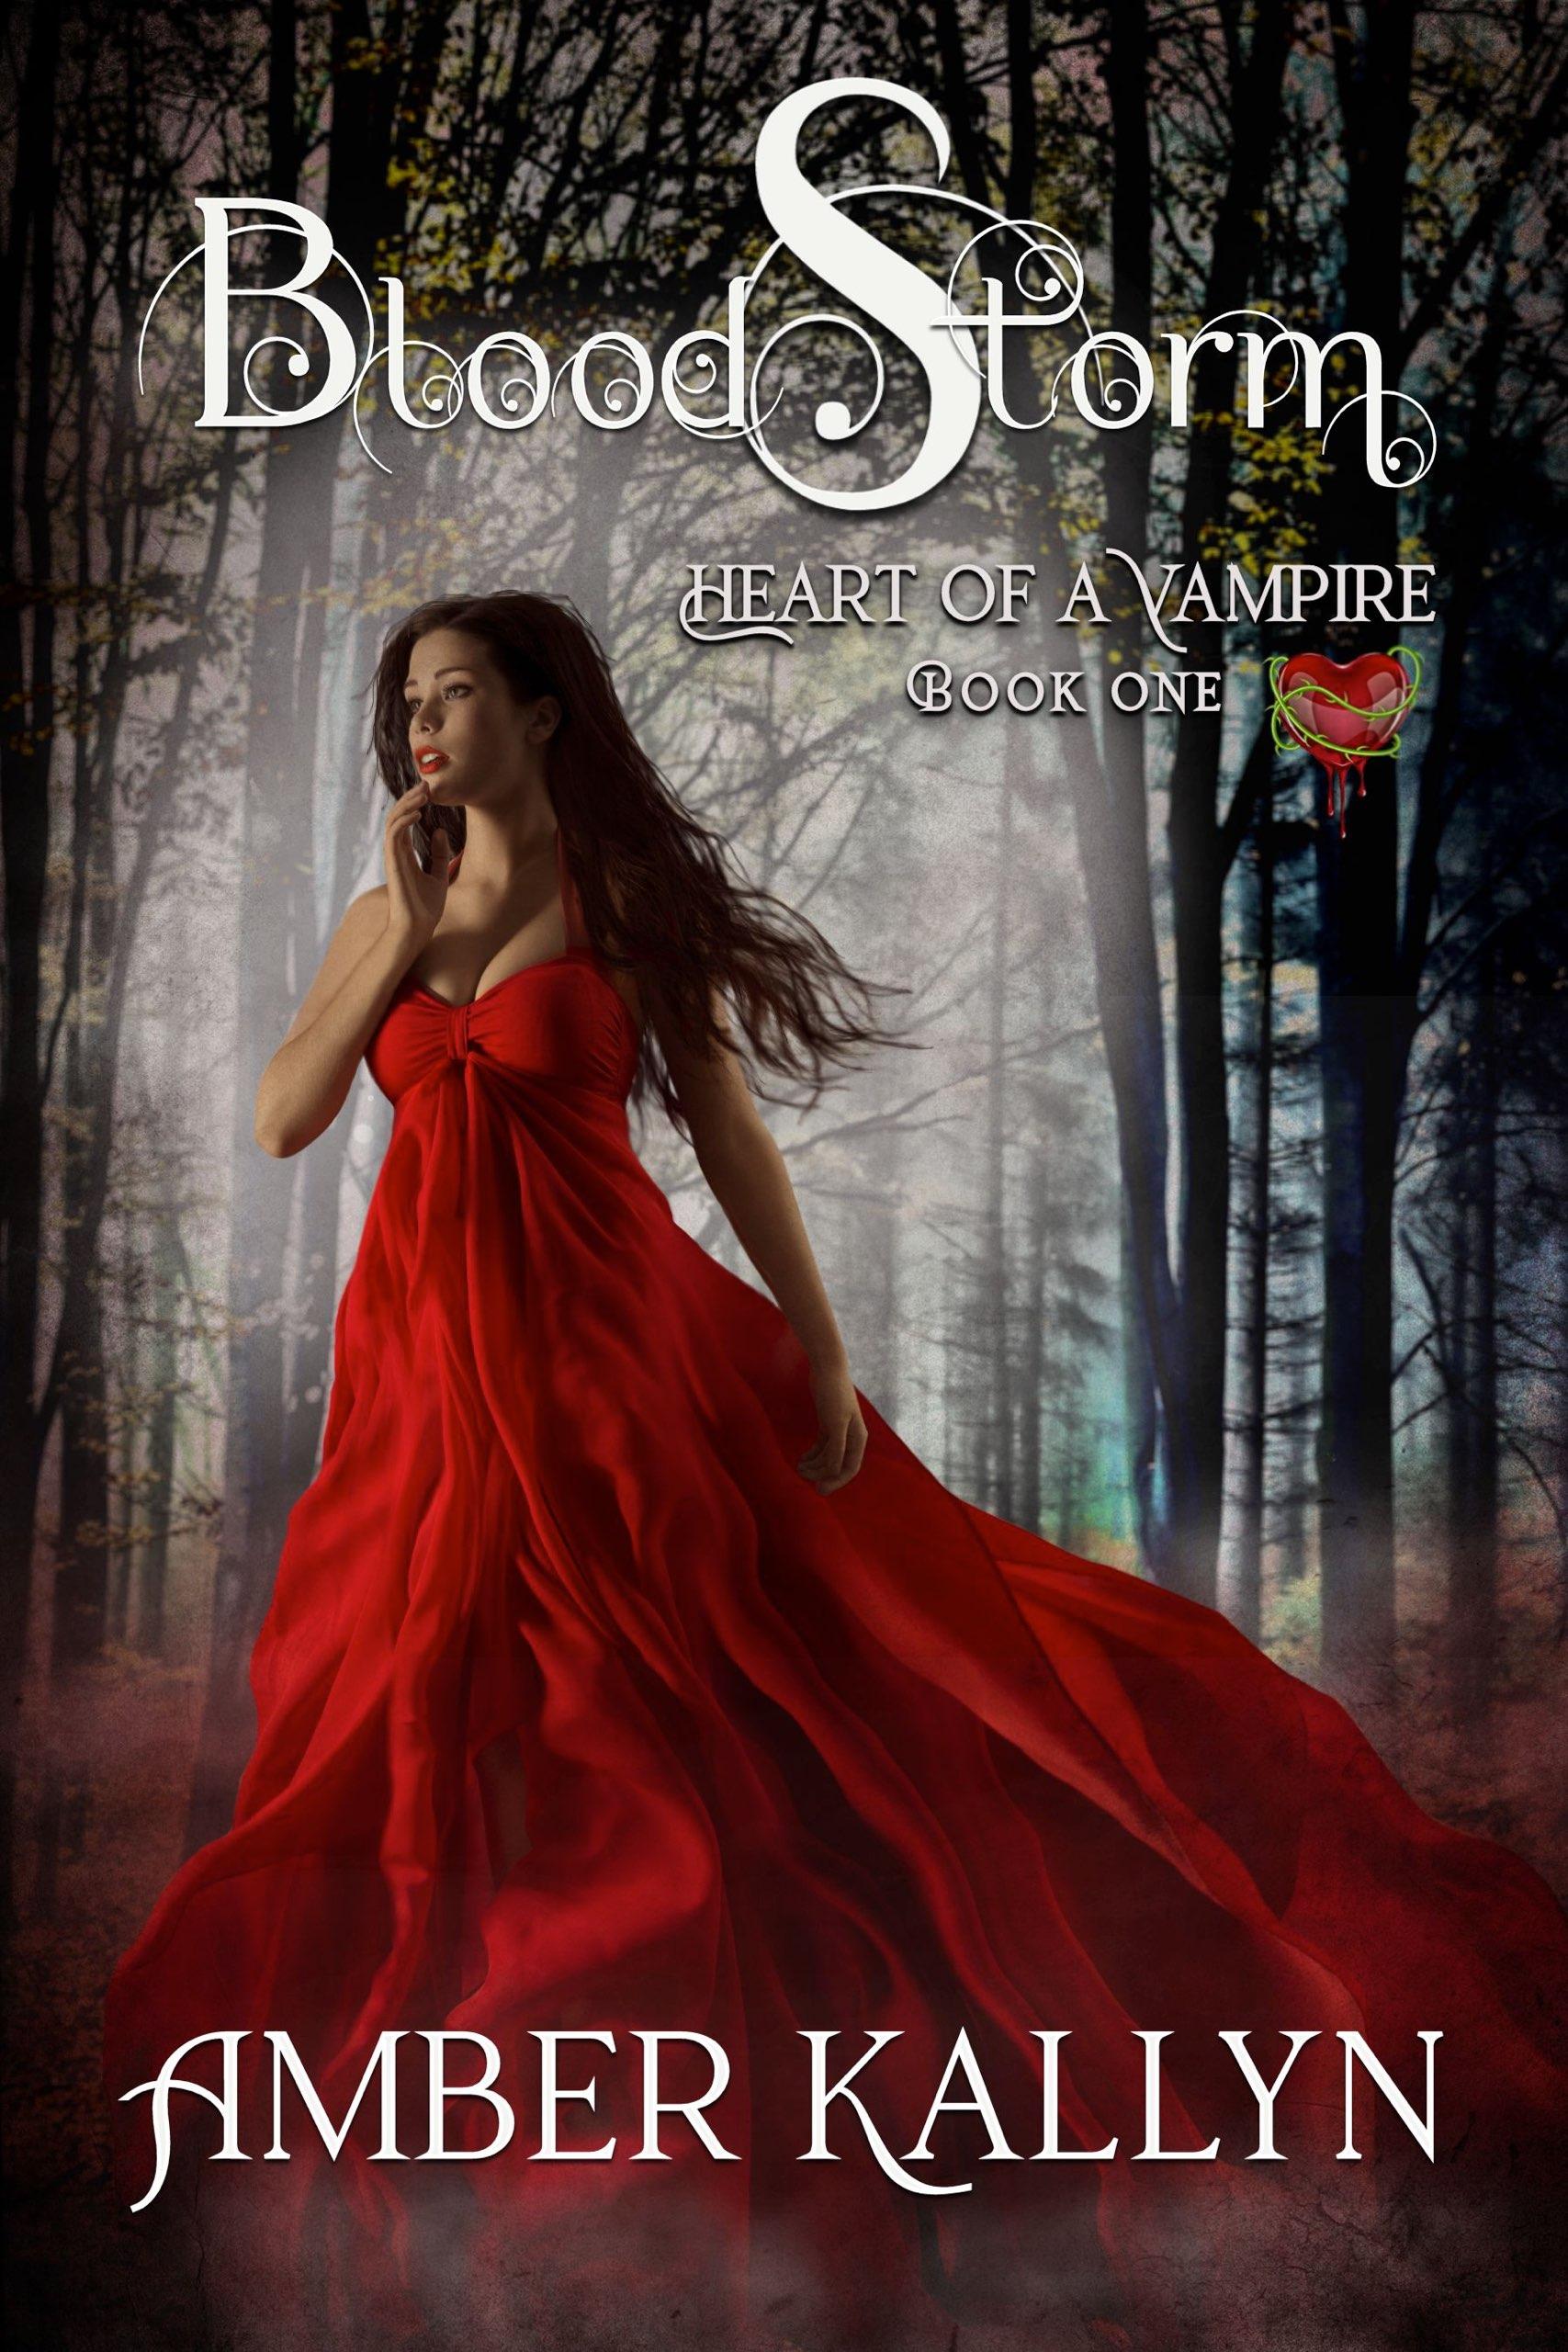 Bloodstorm (Heart of a Vampire, Book 1) (sst-lxxvii)